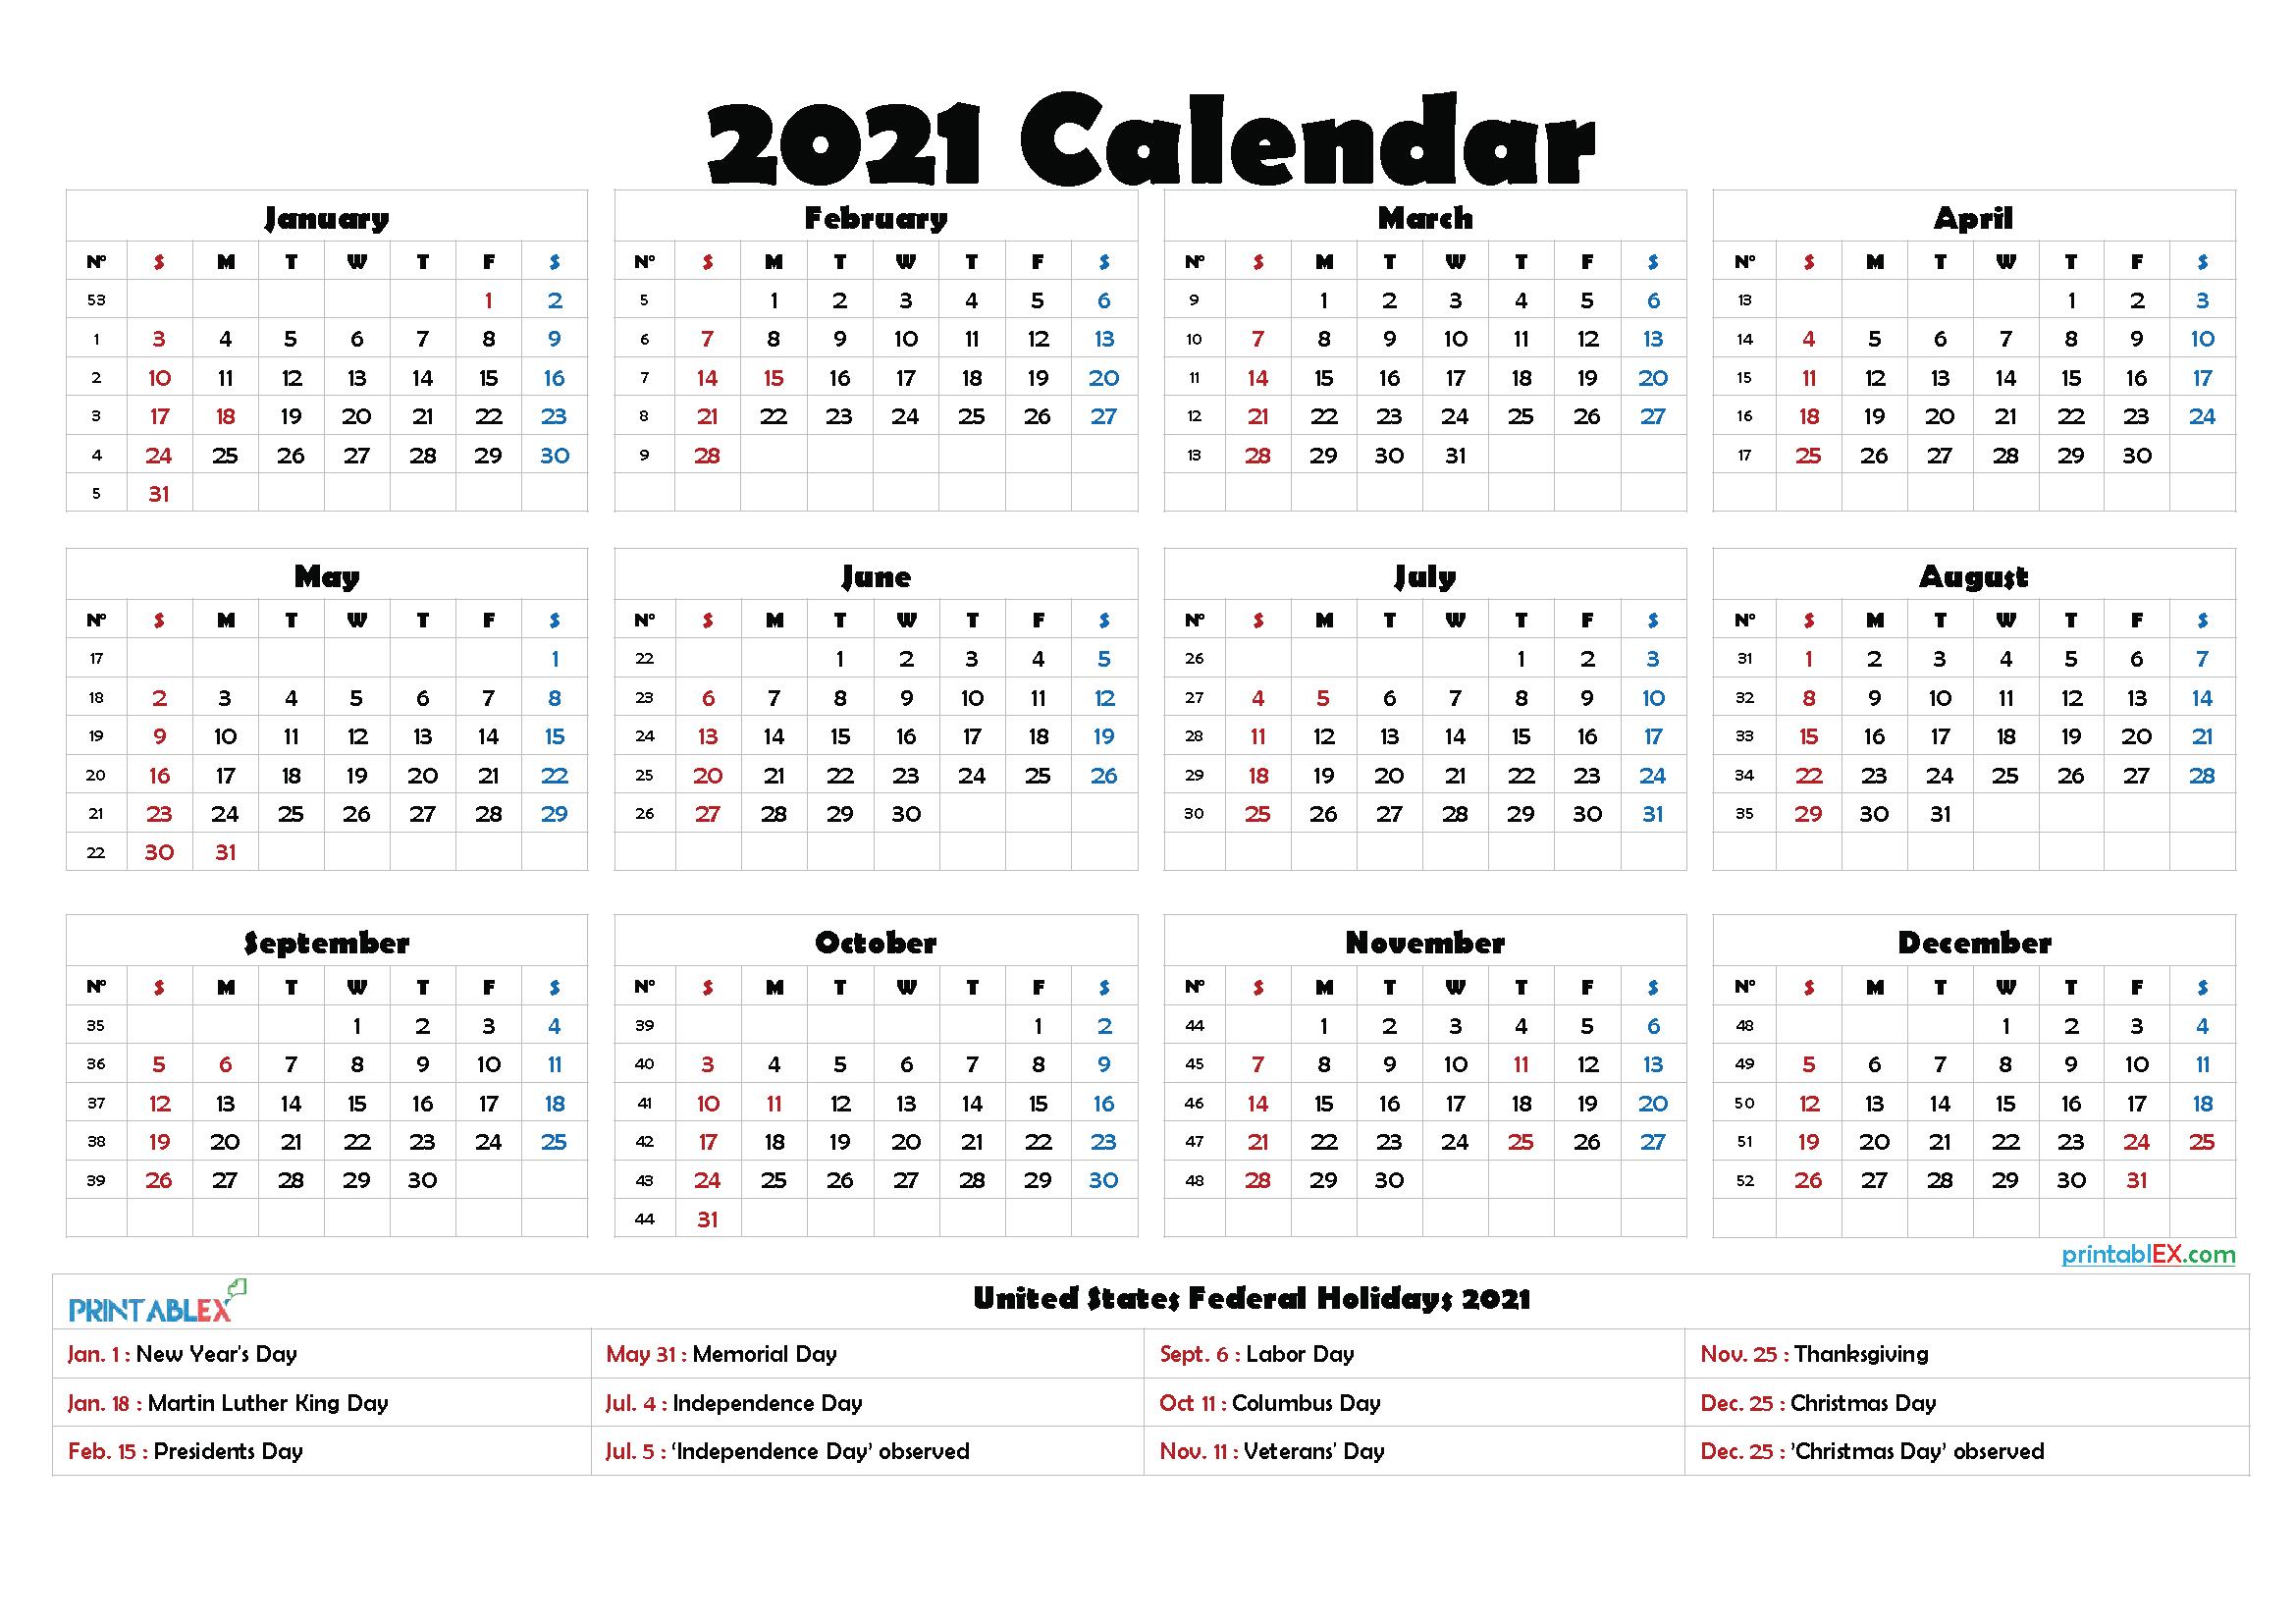 2021 Printable Calendar With Holidays with Federal Government Calendar 2021 Printable